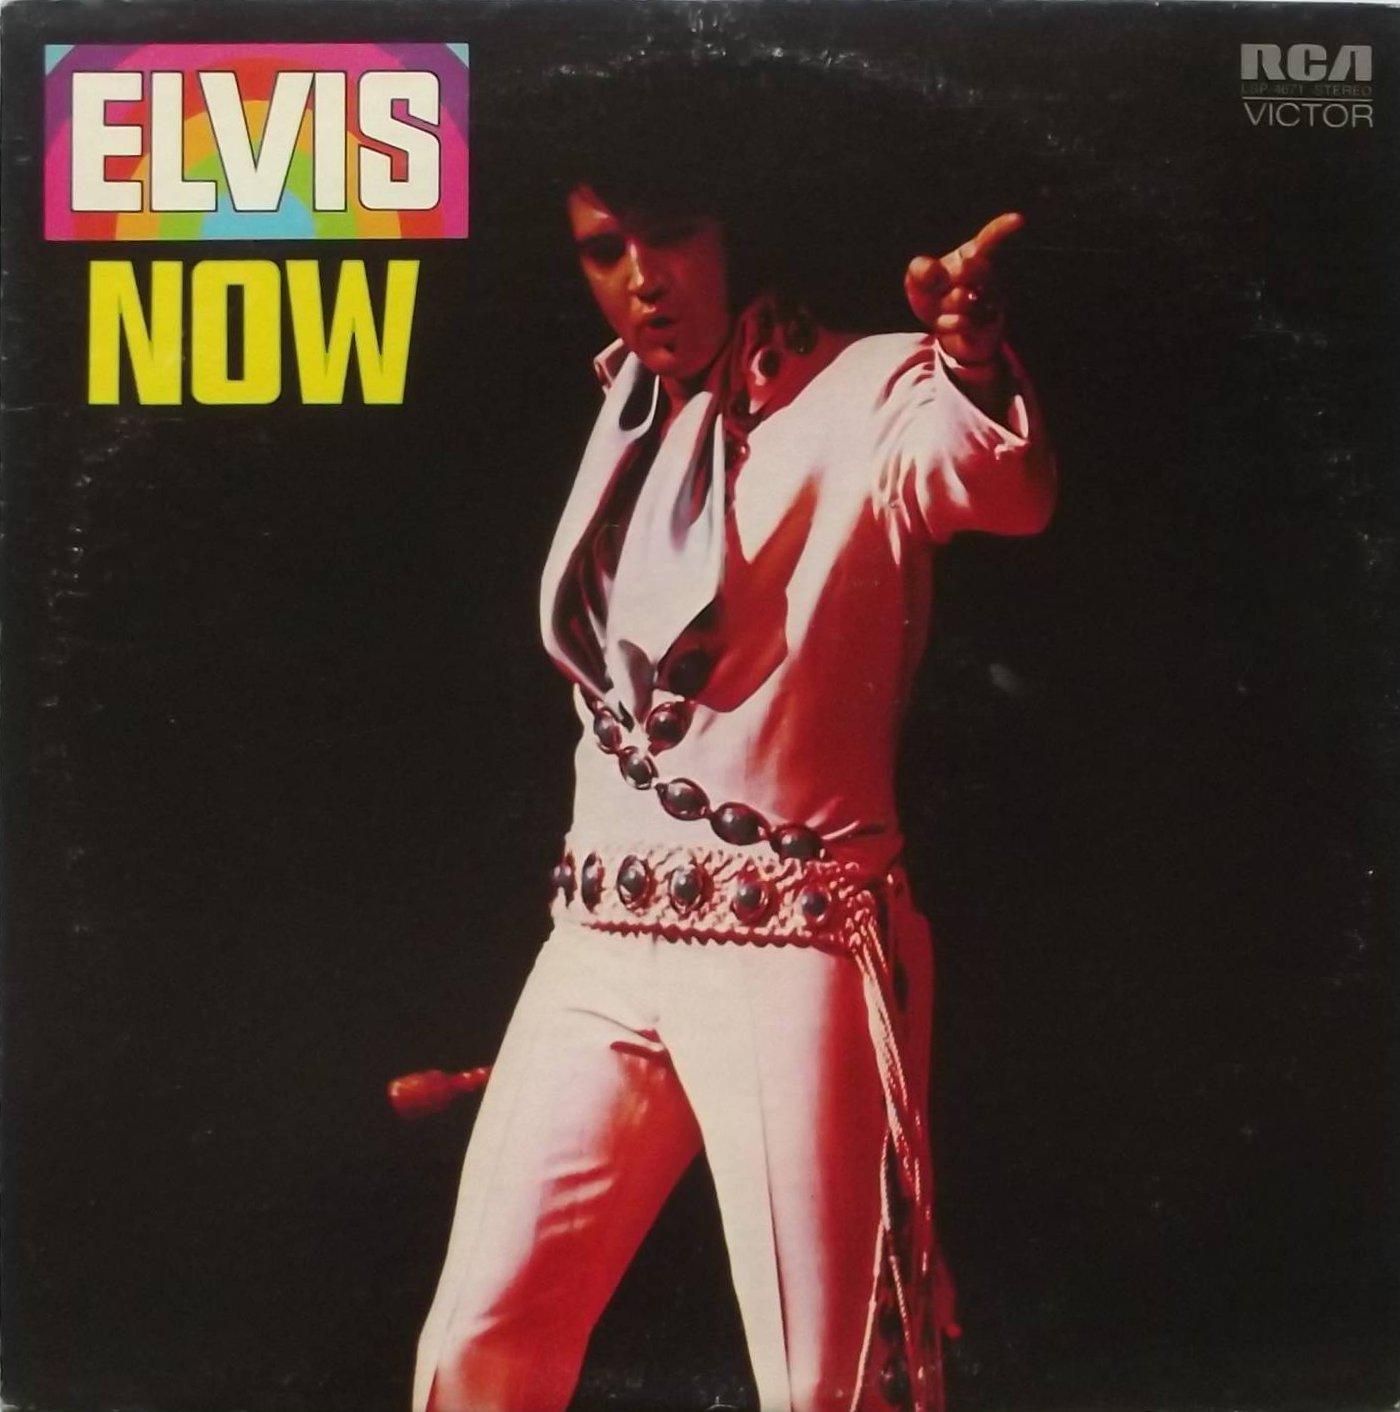 ELVIS NOW Lsp4671bicb17